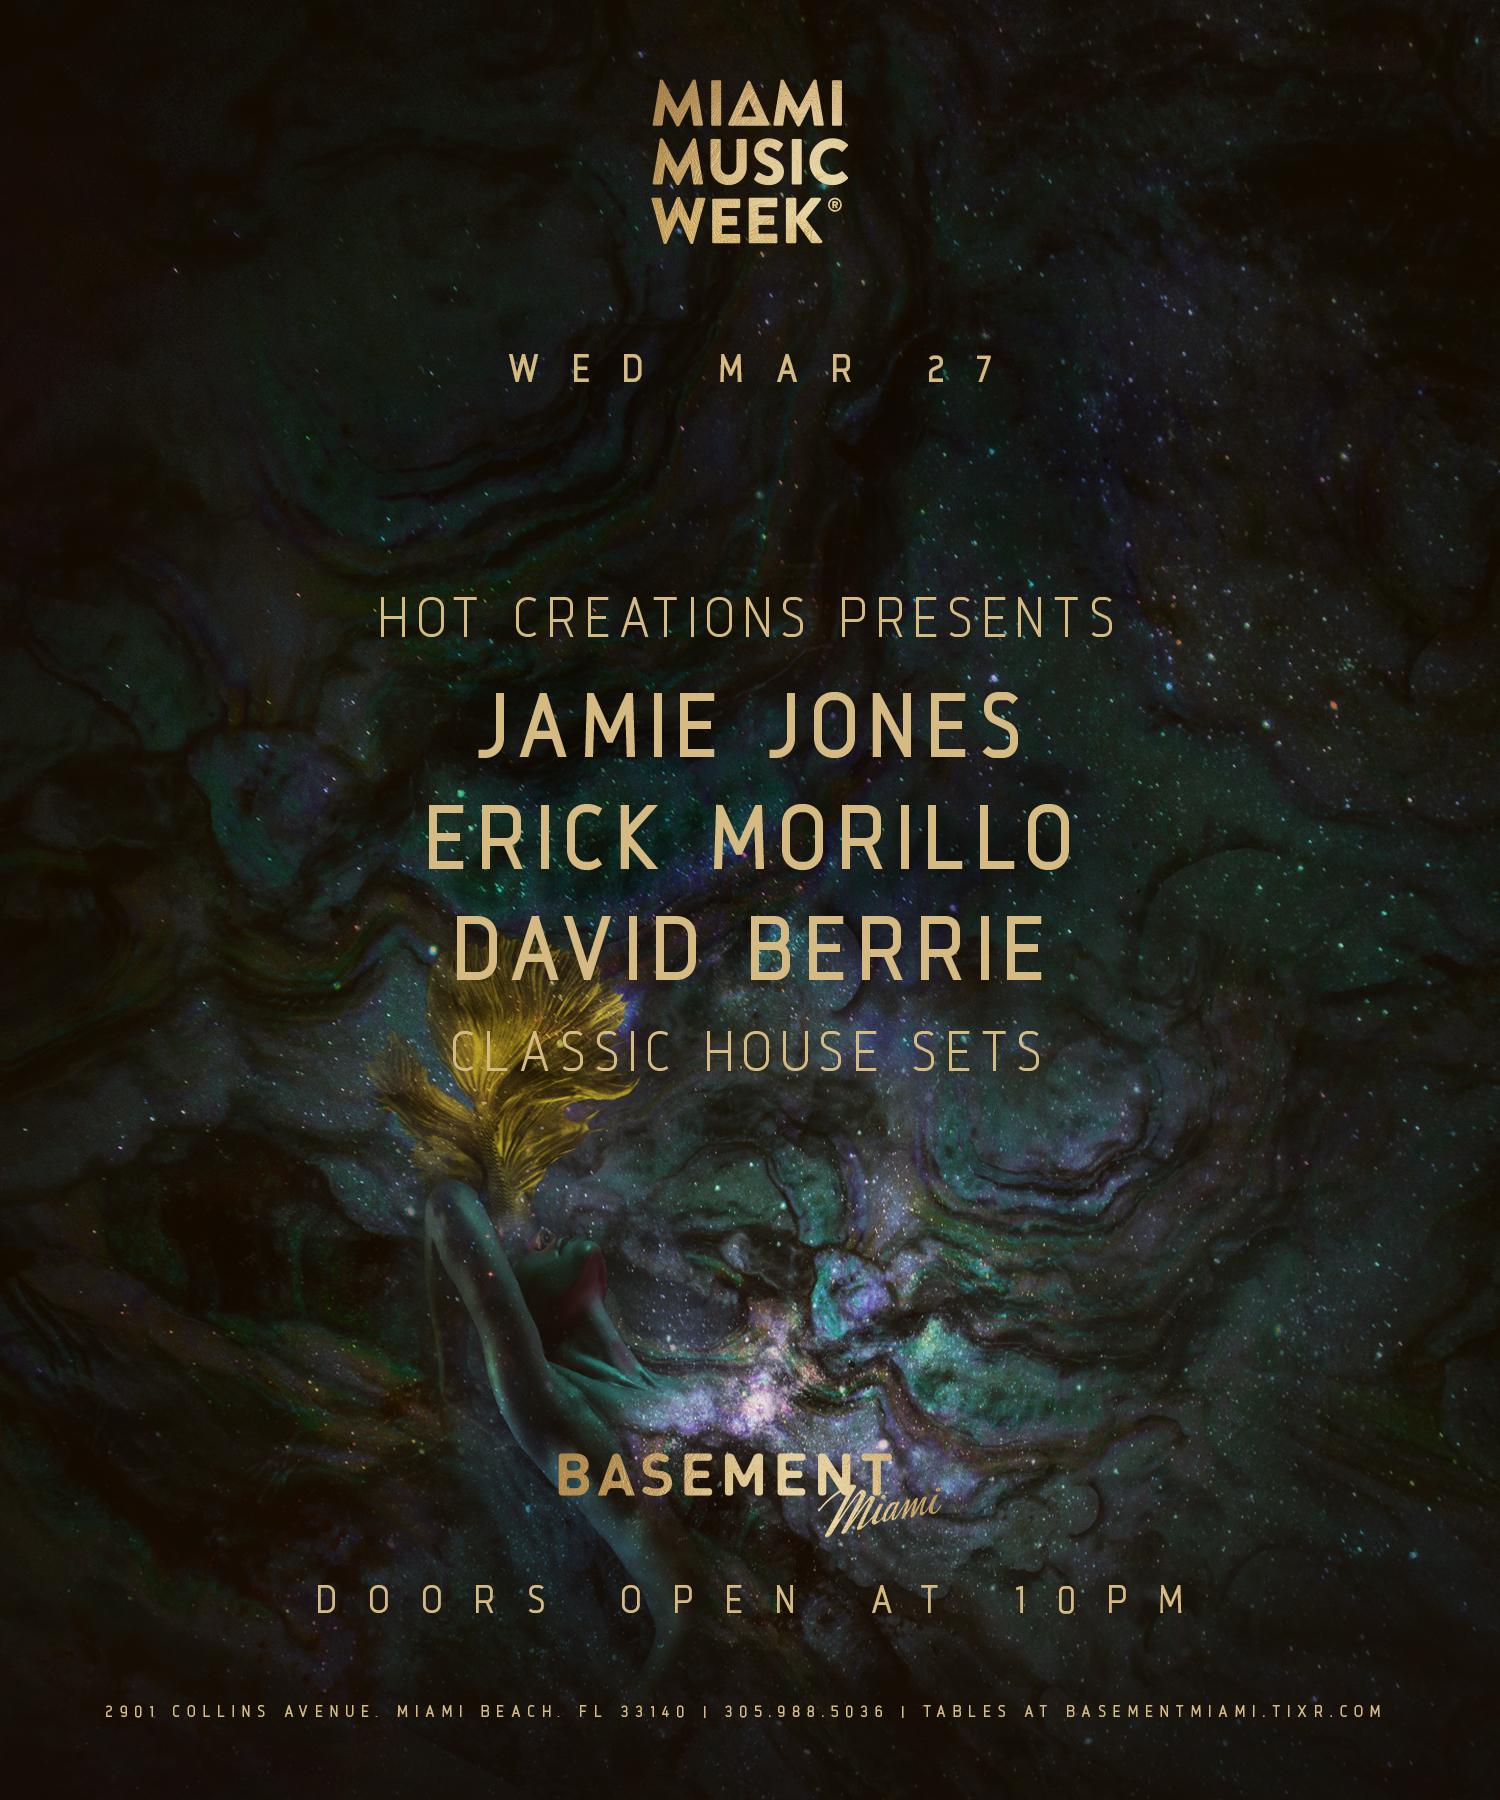 Hot Creations Presents: Jamie Jones, Erick Morillo & David Berrie Image